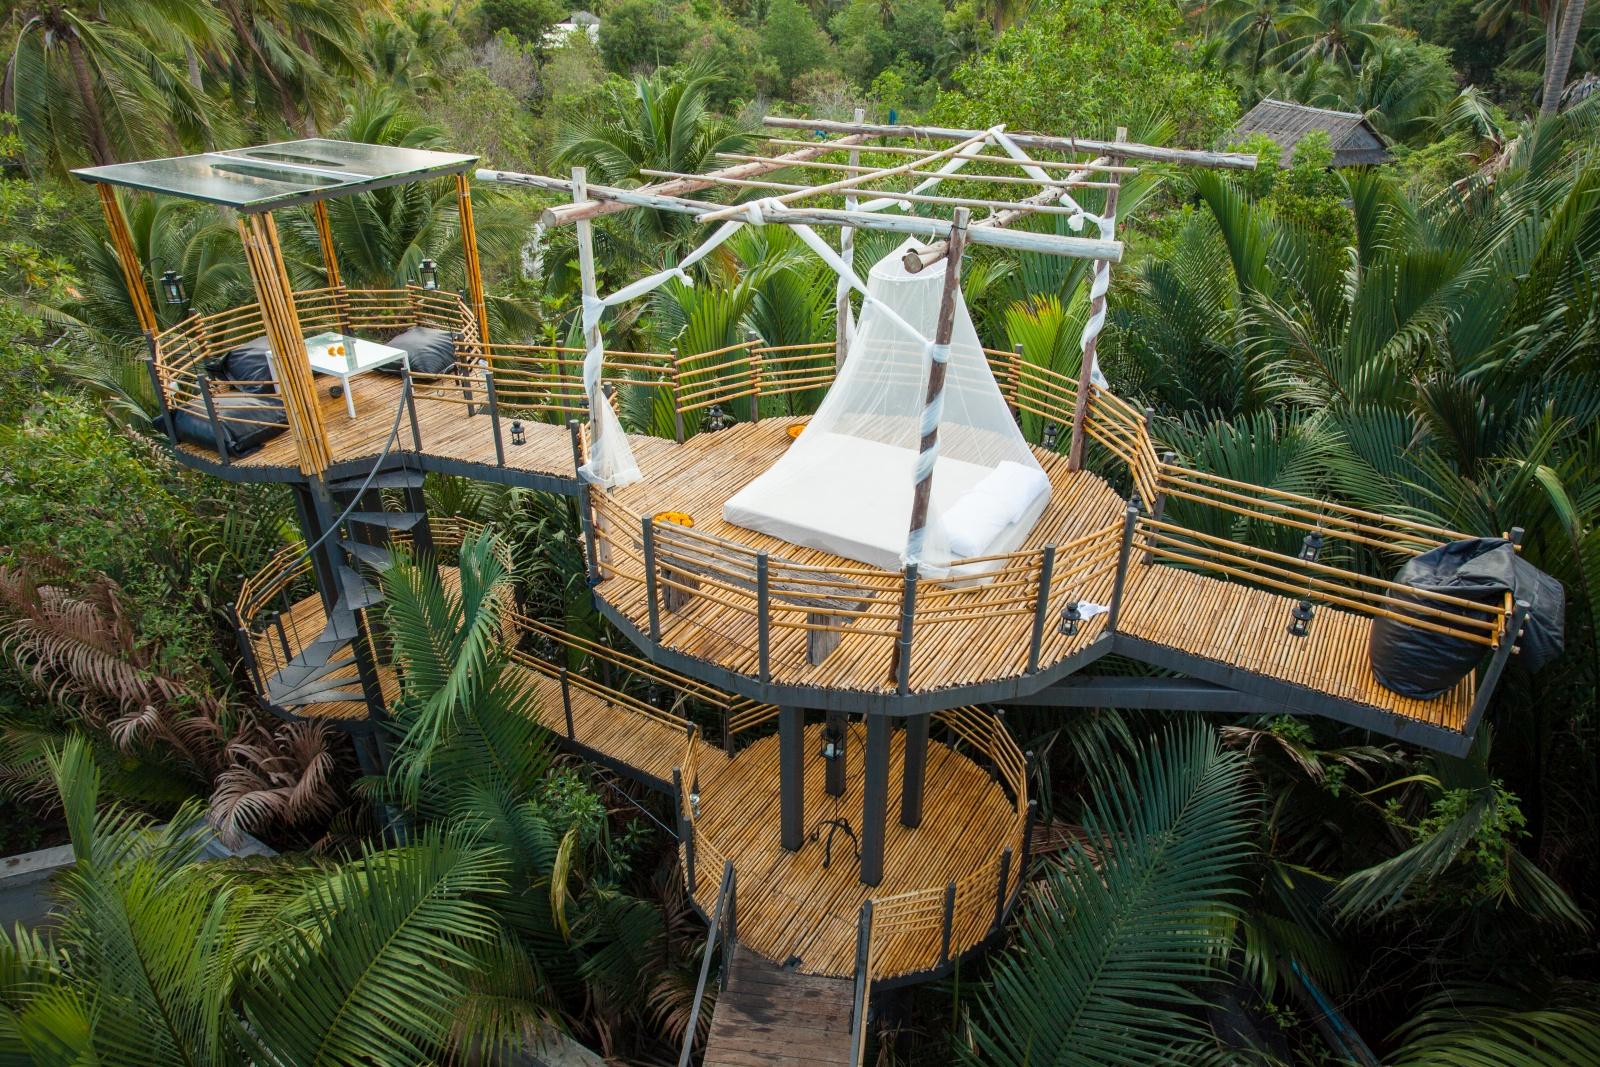 Bangkok Tree House - Eco-Friendly Escape